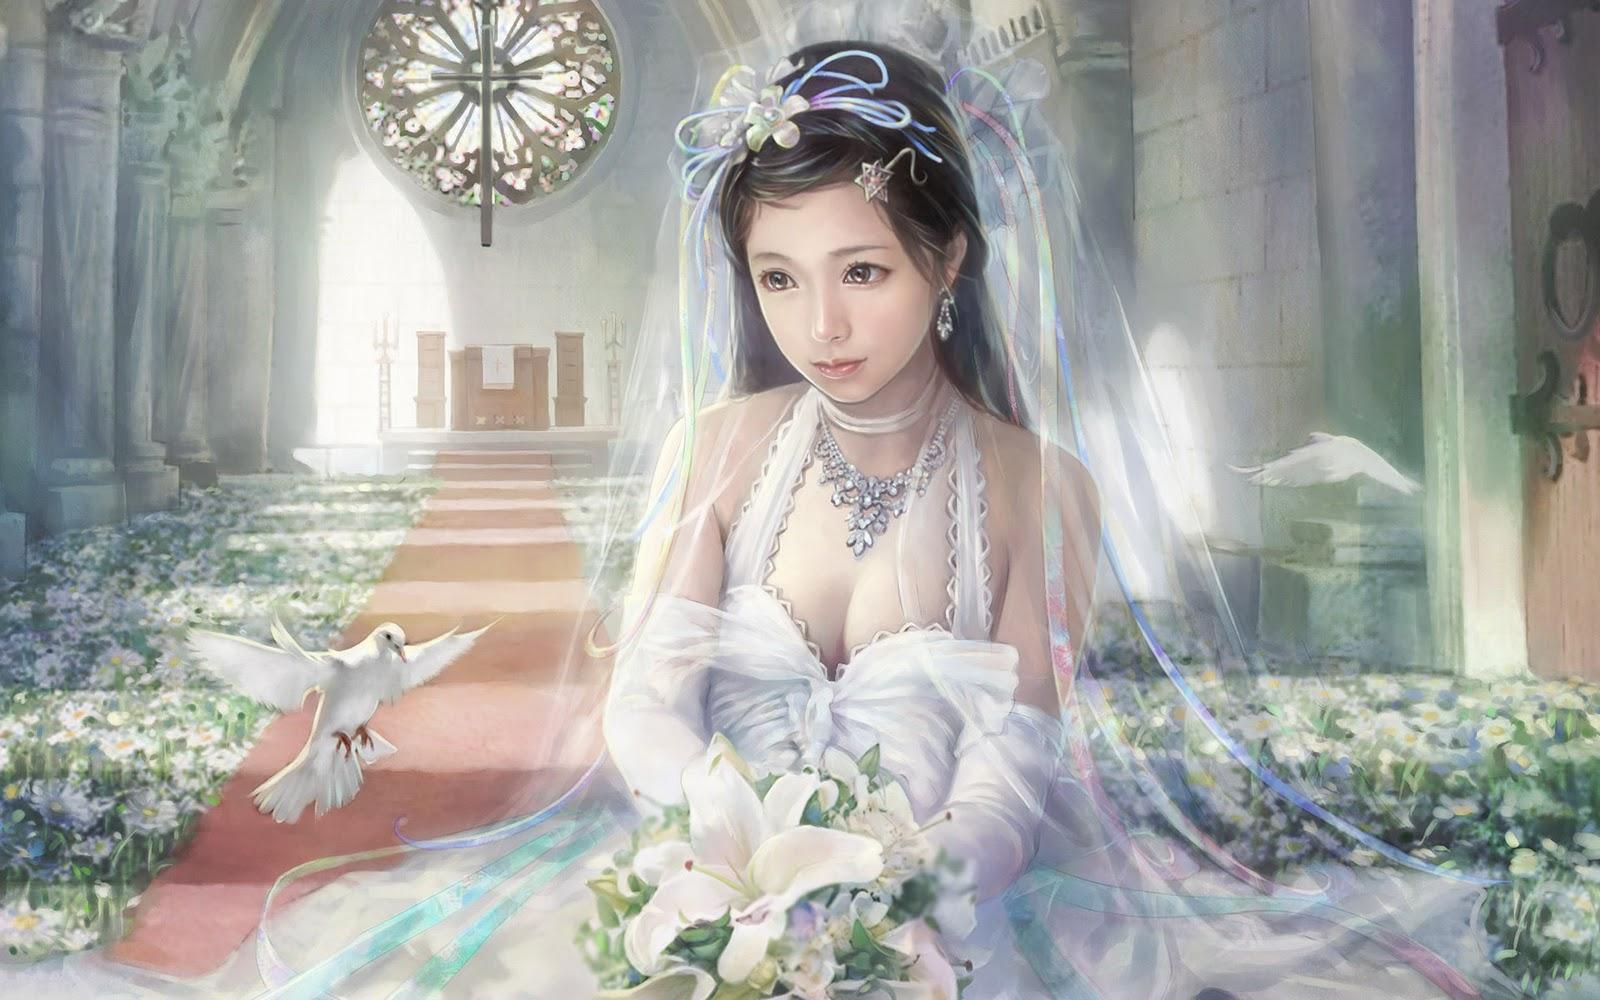 beautiful girl fantasy wallpaper - photo #29